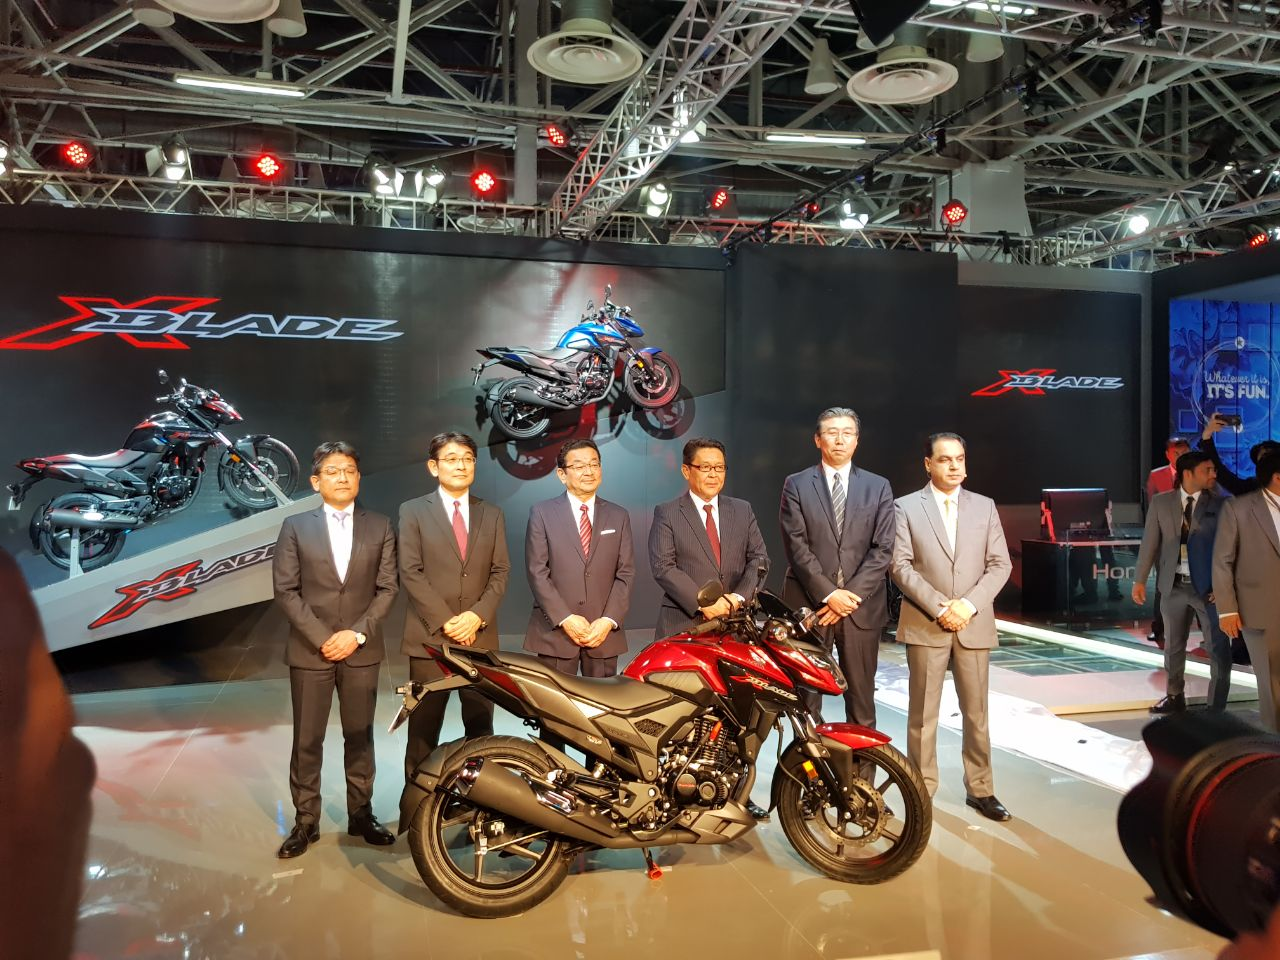 Hondas Brand New 160cc Motorcycle X Blade